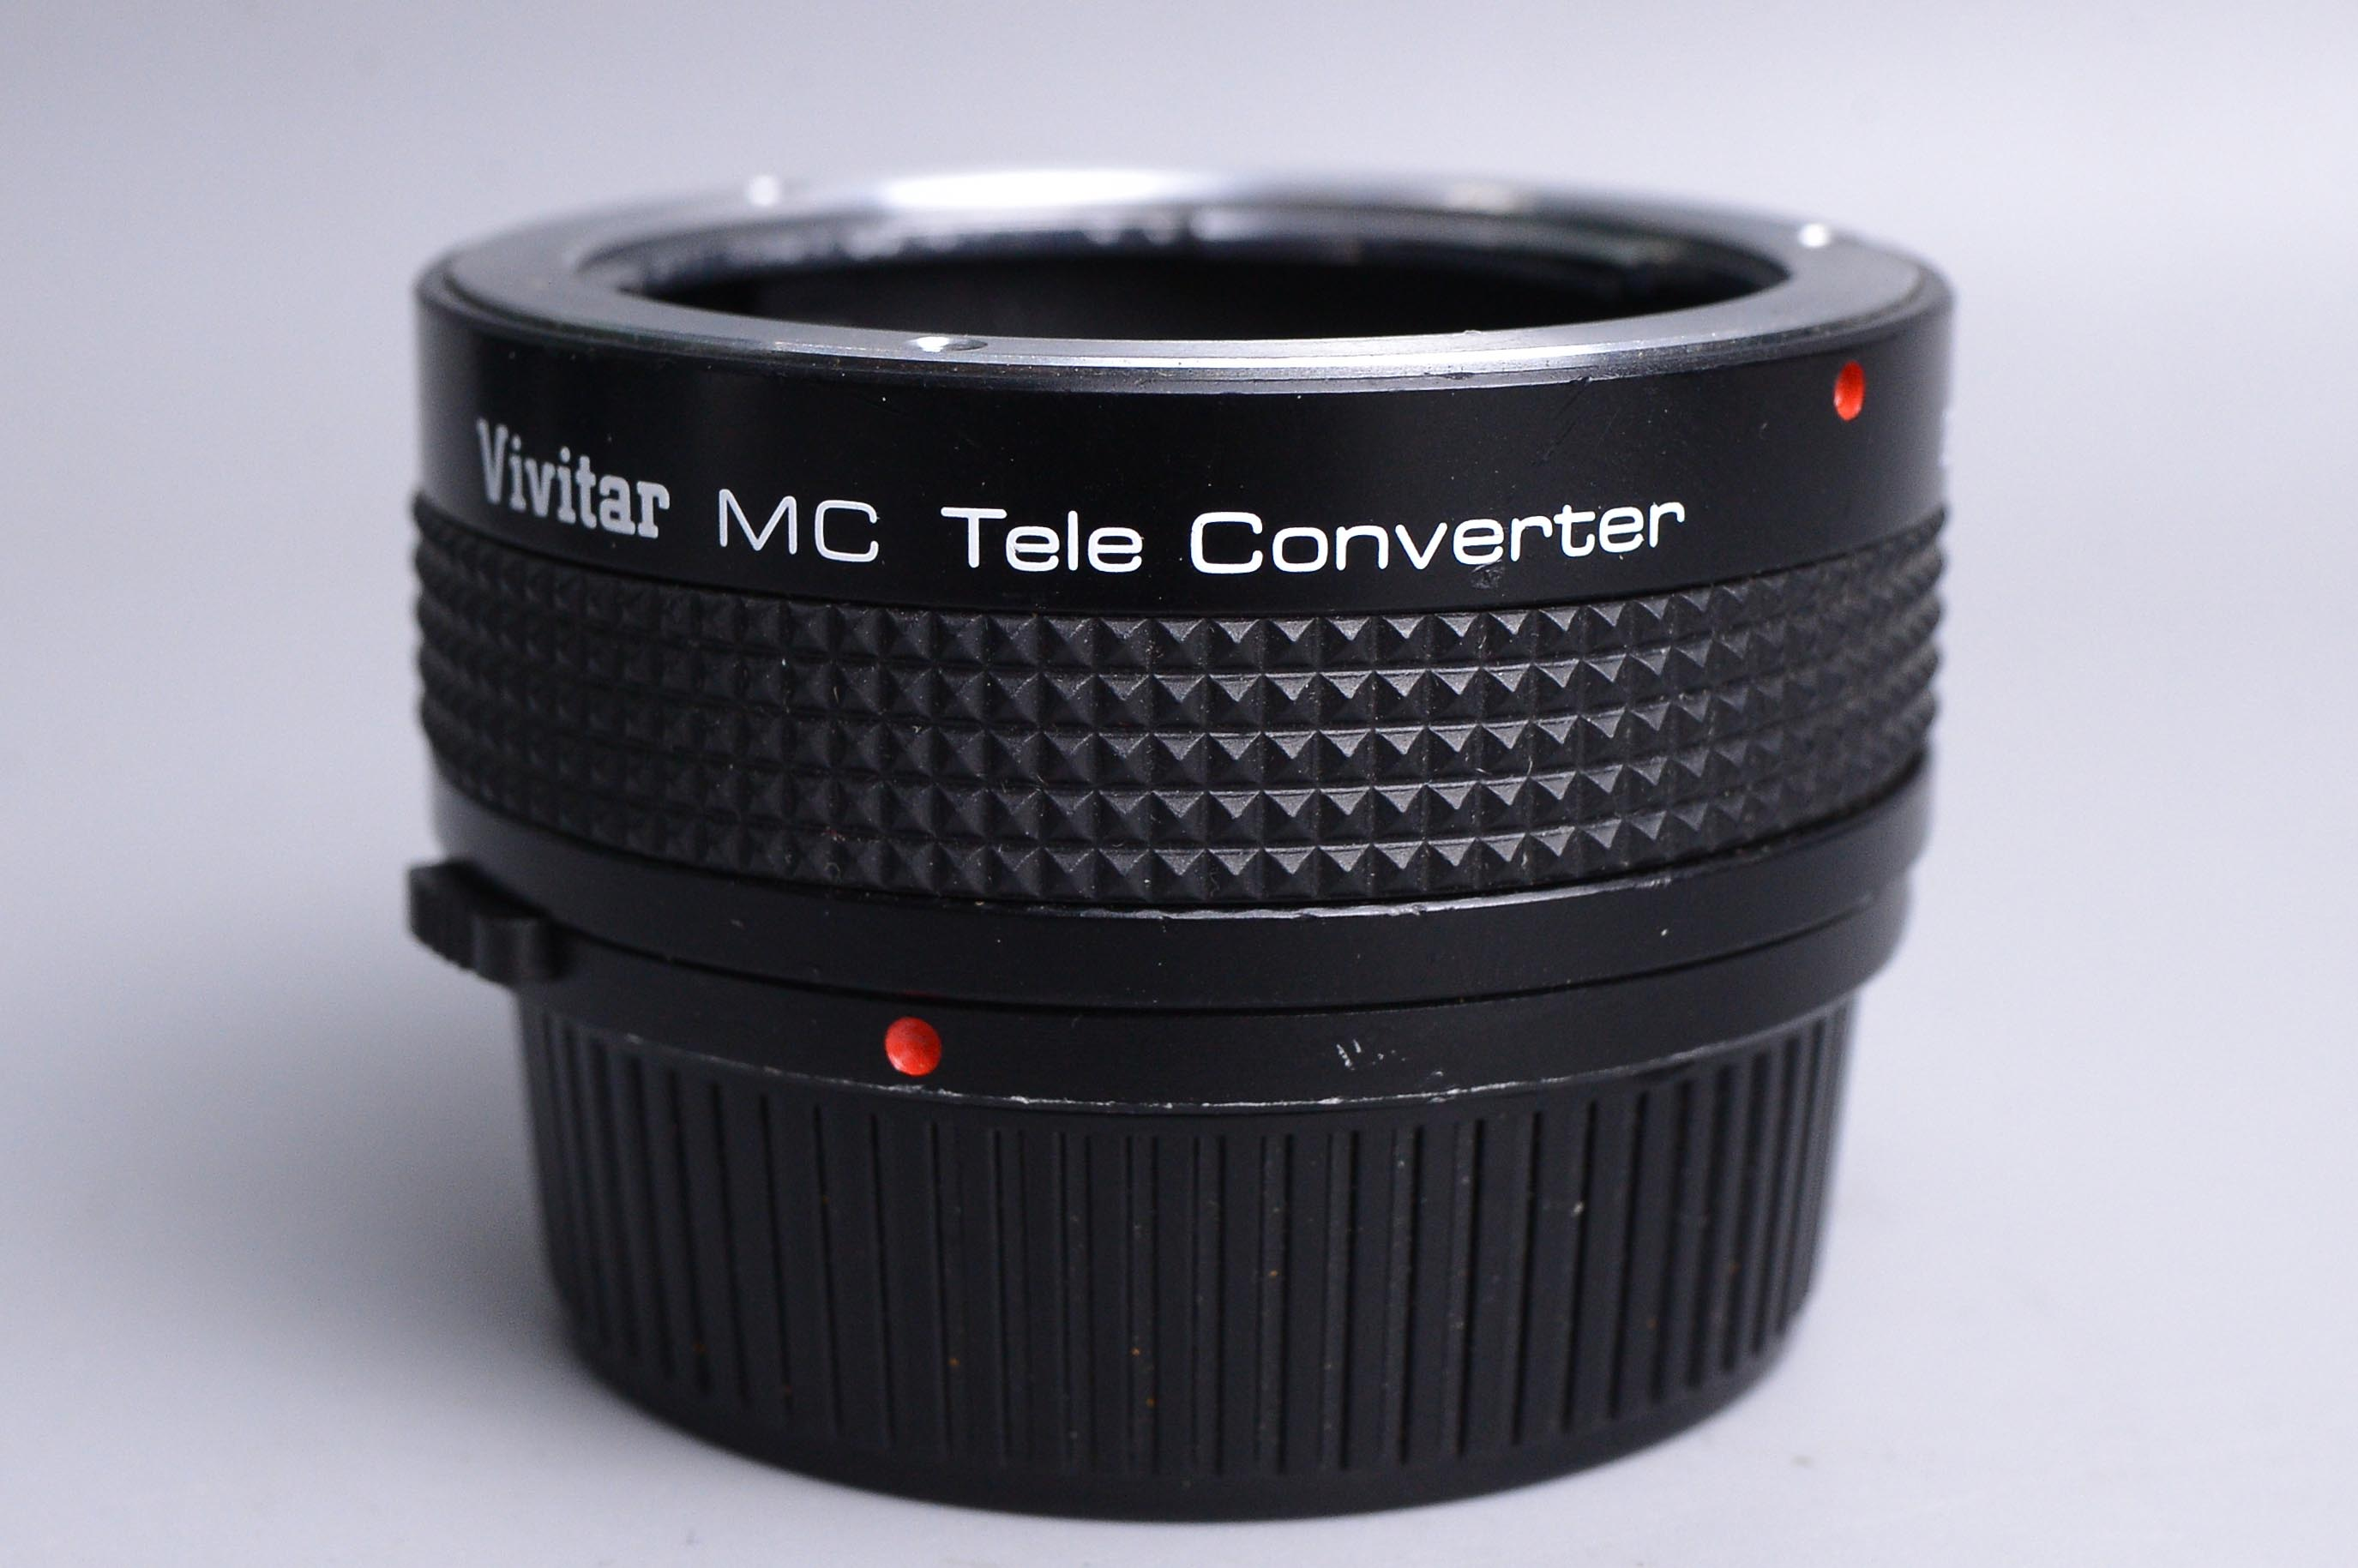 vivitar-mc-tele-converter-2x-21-ngam-om